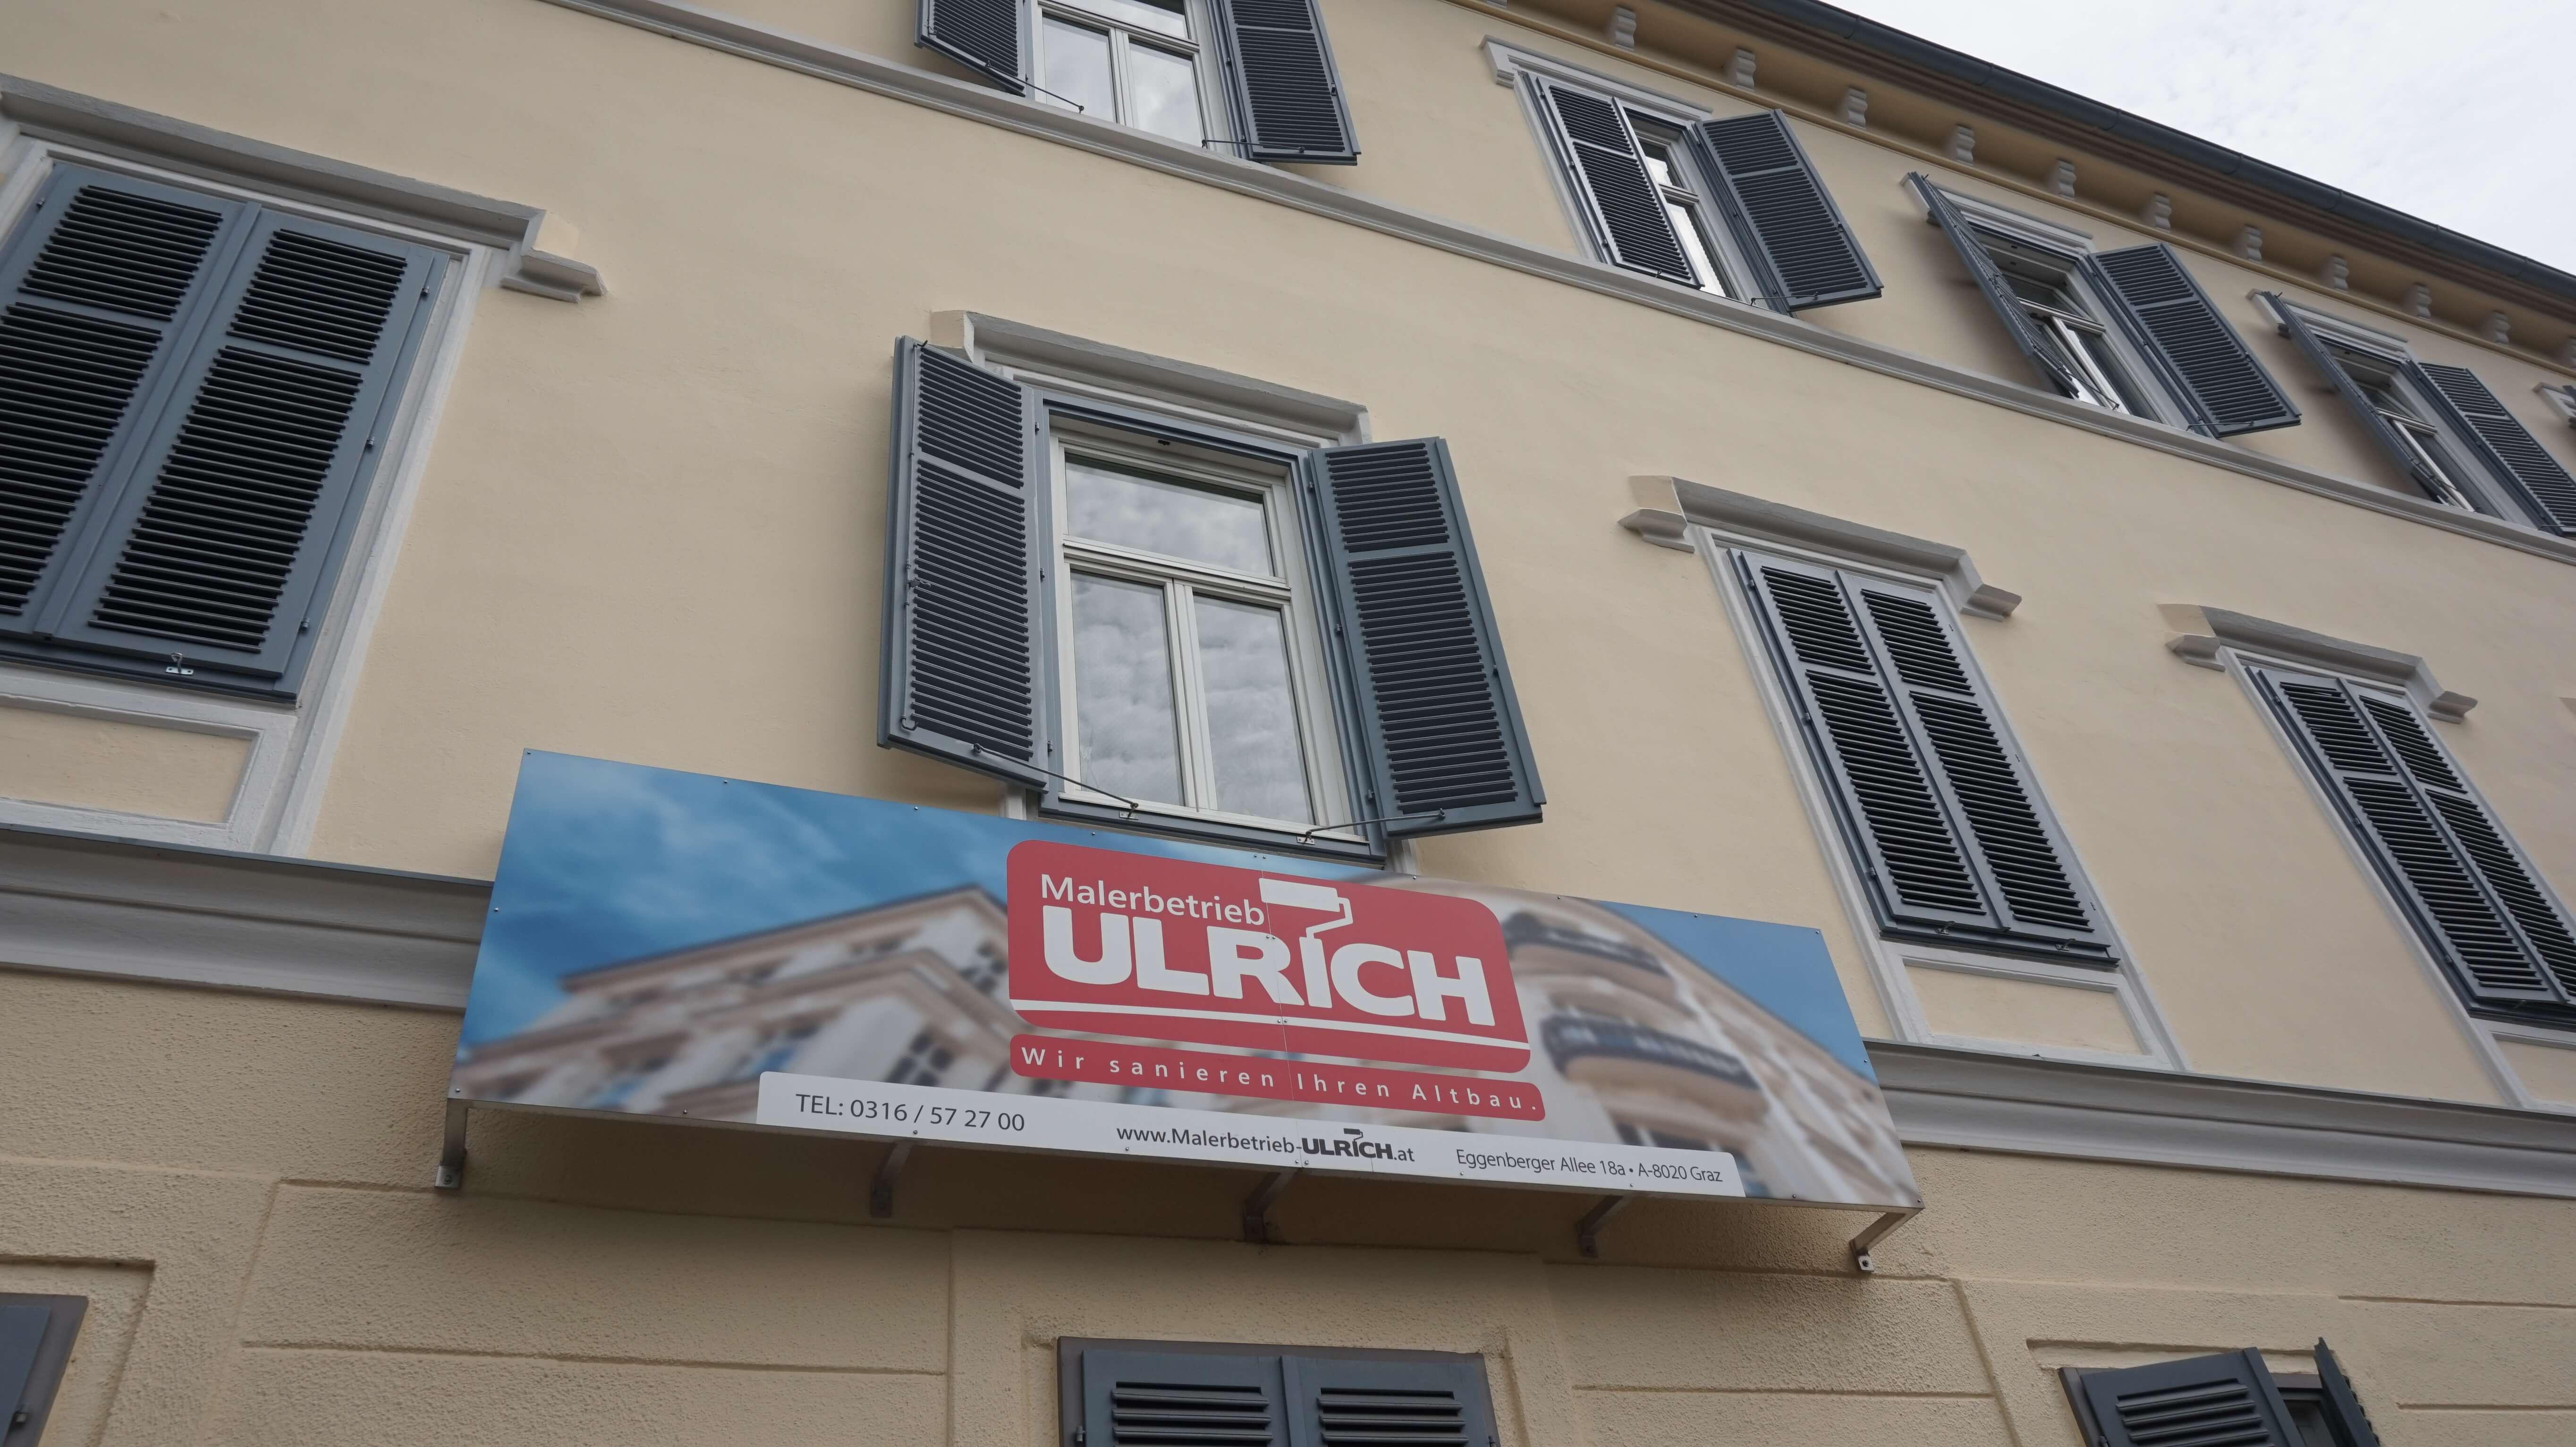 malerbetrieb-ulrich-fassade-ulrich2